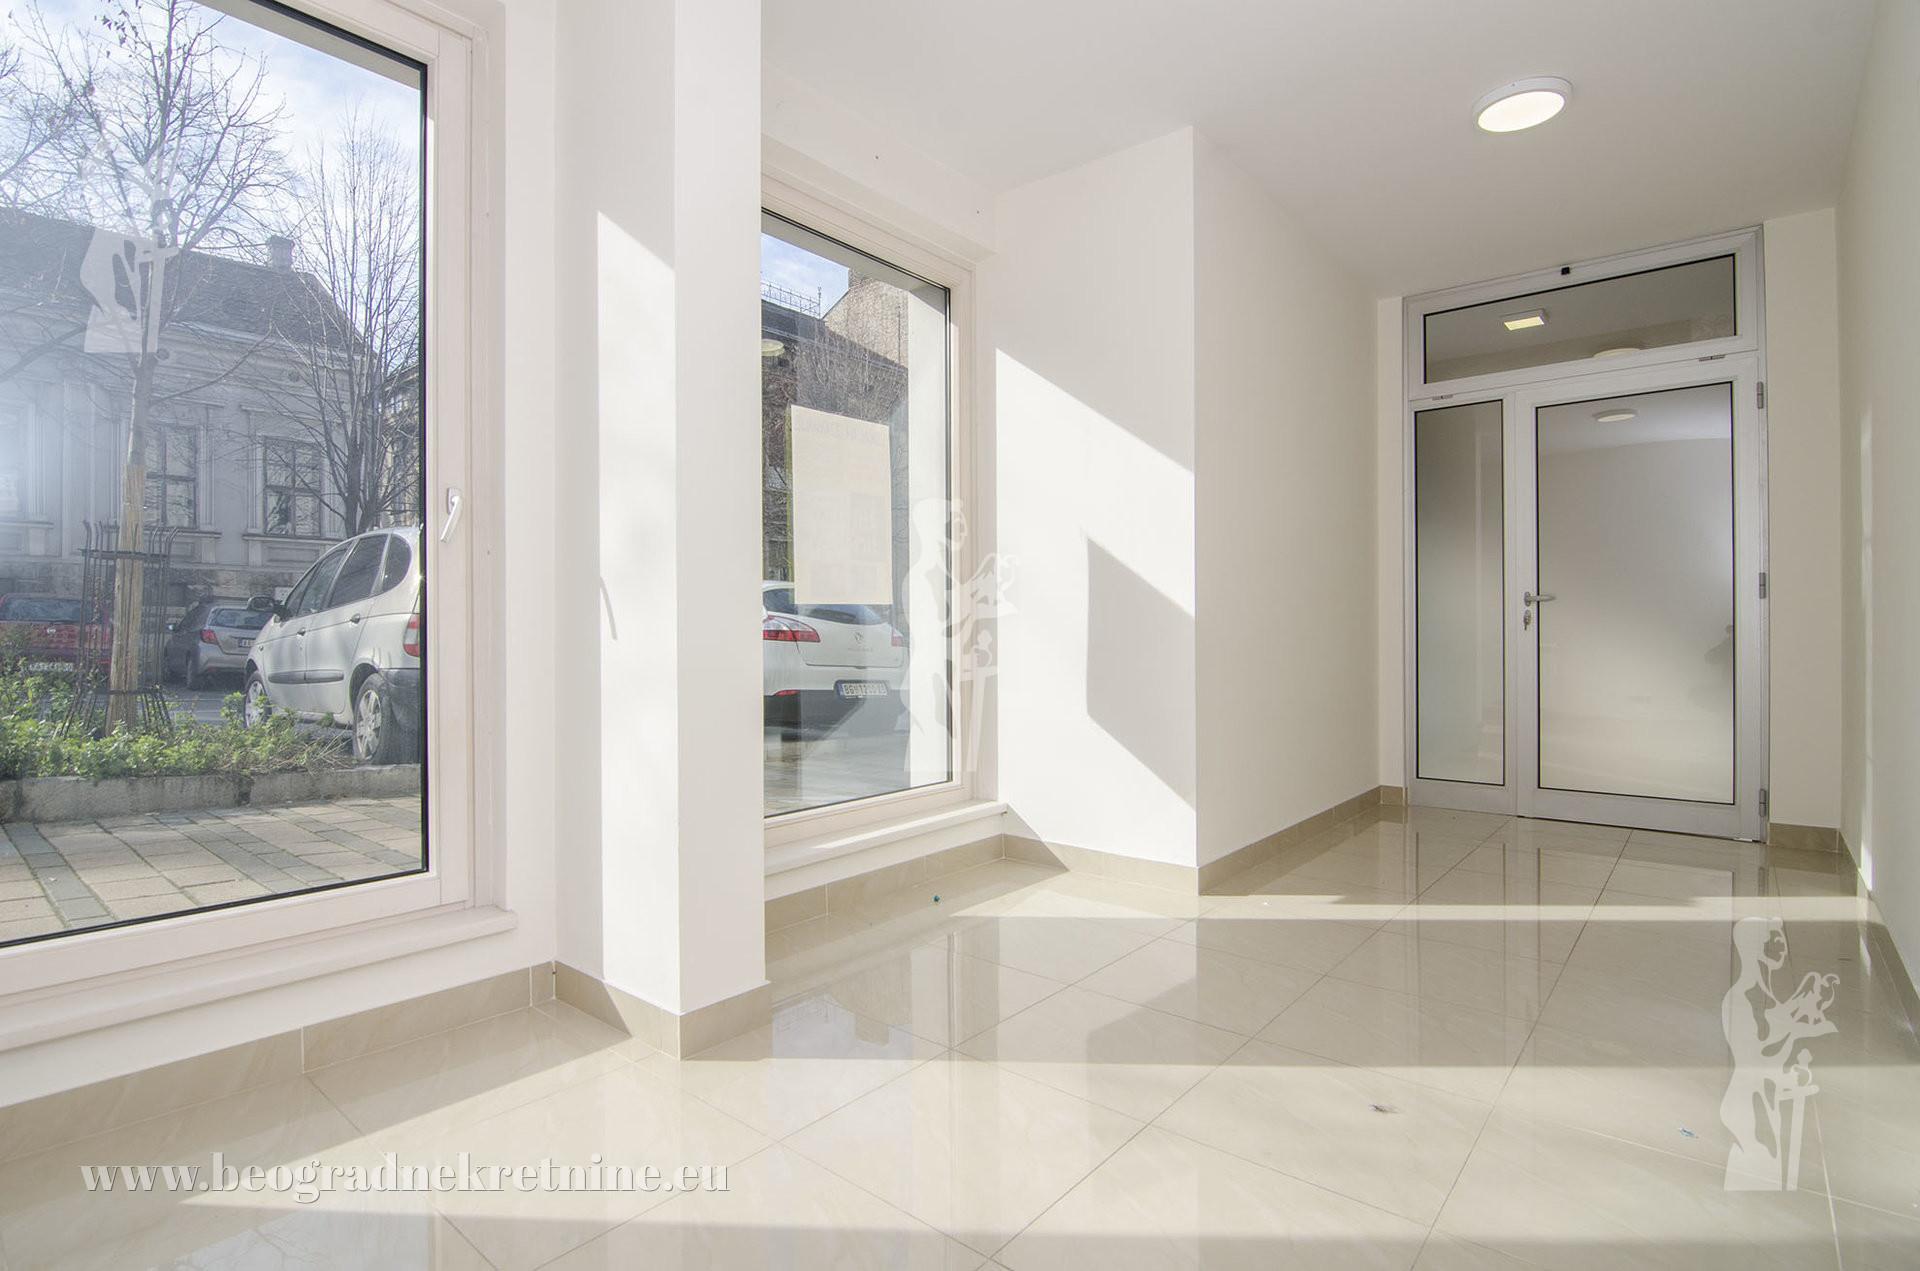 Lokal Savski Venac duplex 157m2 Pr I III g